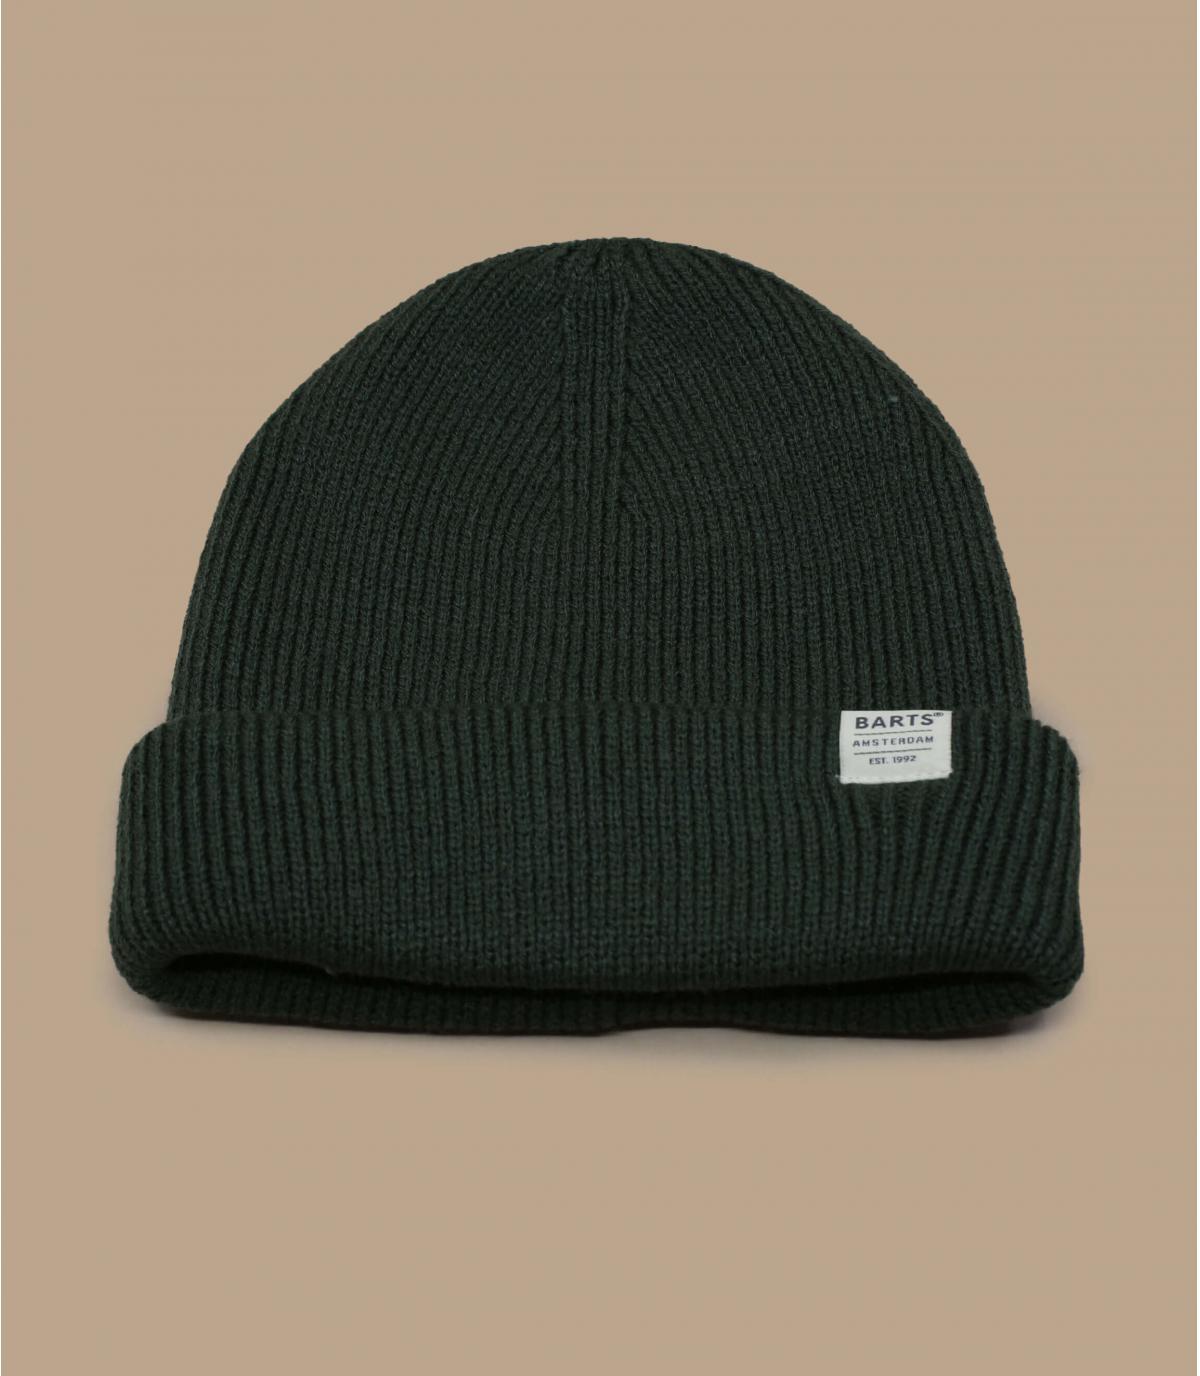 Docker Mütze grün Barts